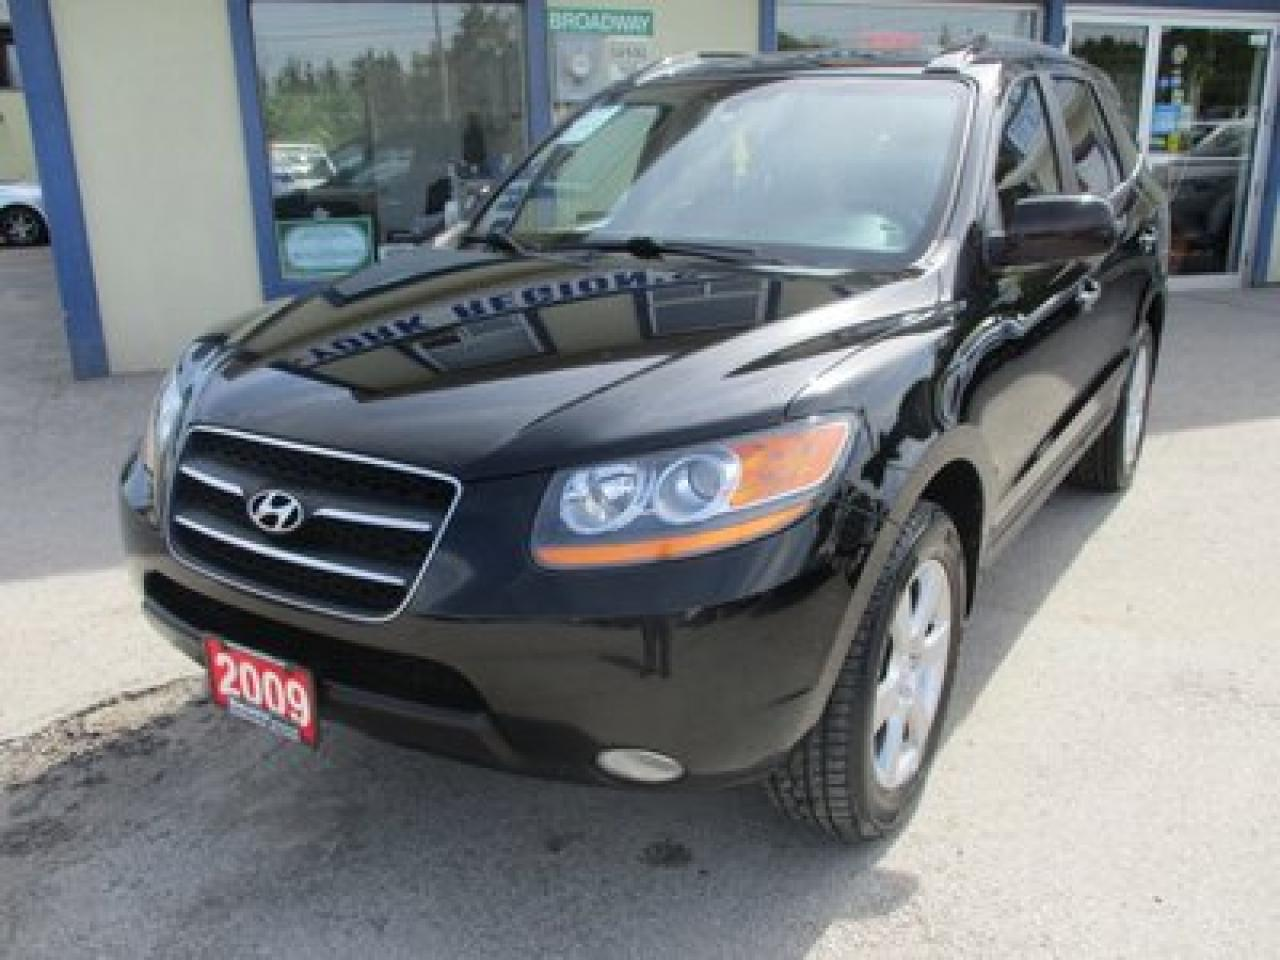 2009 Hyundai Santa Fe 'GREAT VALUE' LIMITED EDITION 5 PASSENGER 3.3L - V6.. AWD.. LEATHER.. HEATED SEATS.. CD/AUX/USB INPUT.. POWER SUNROOF..